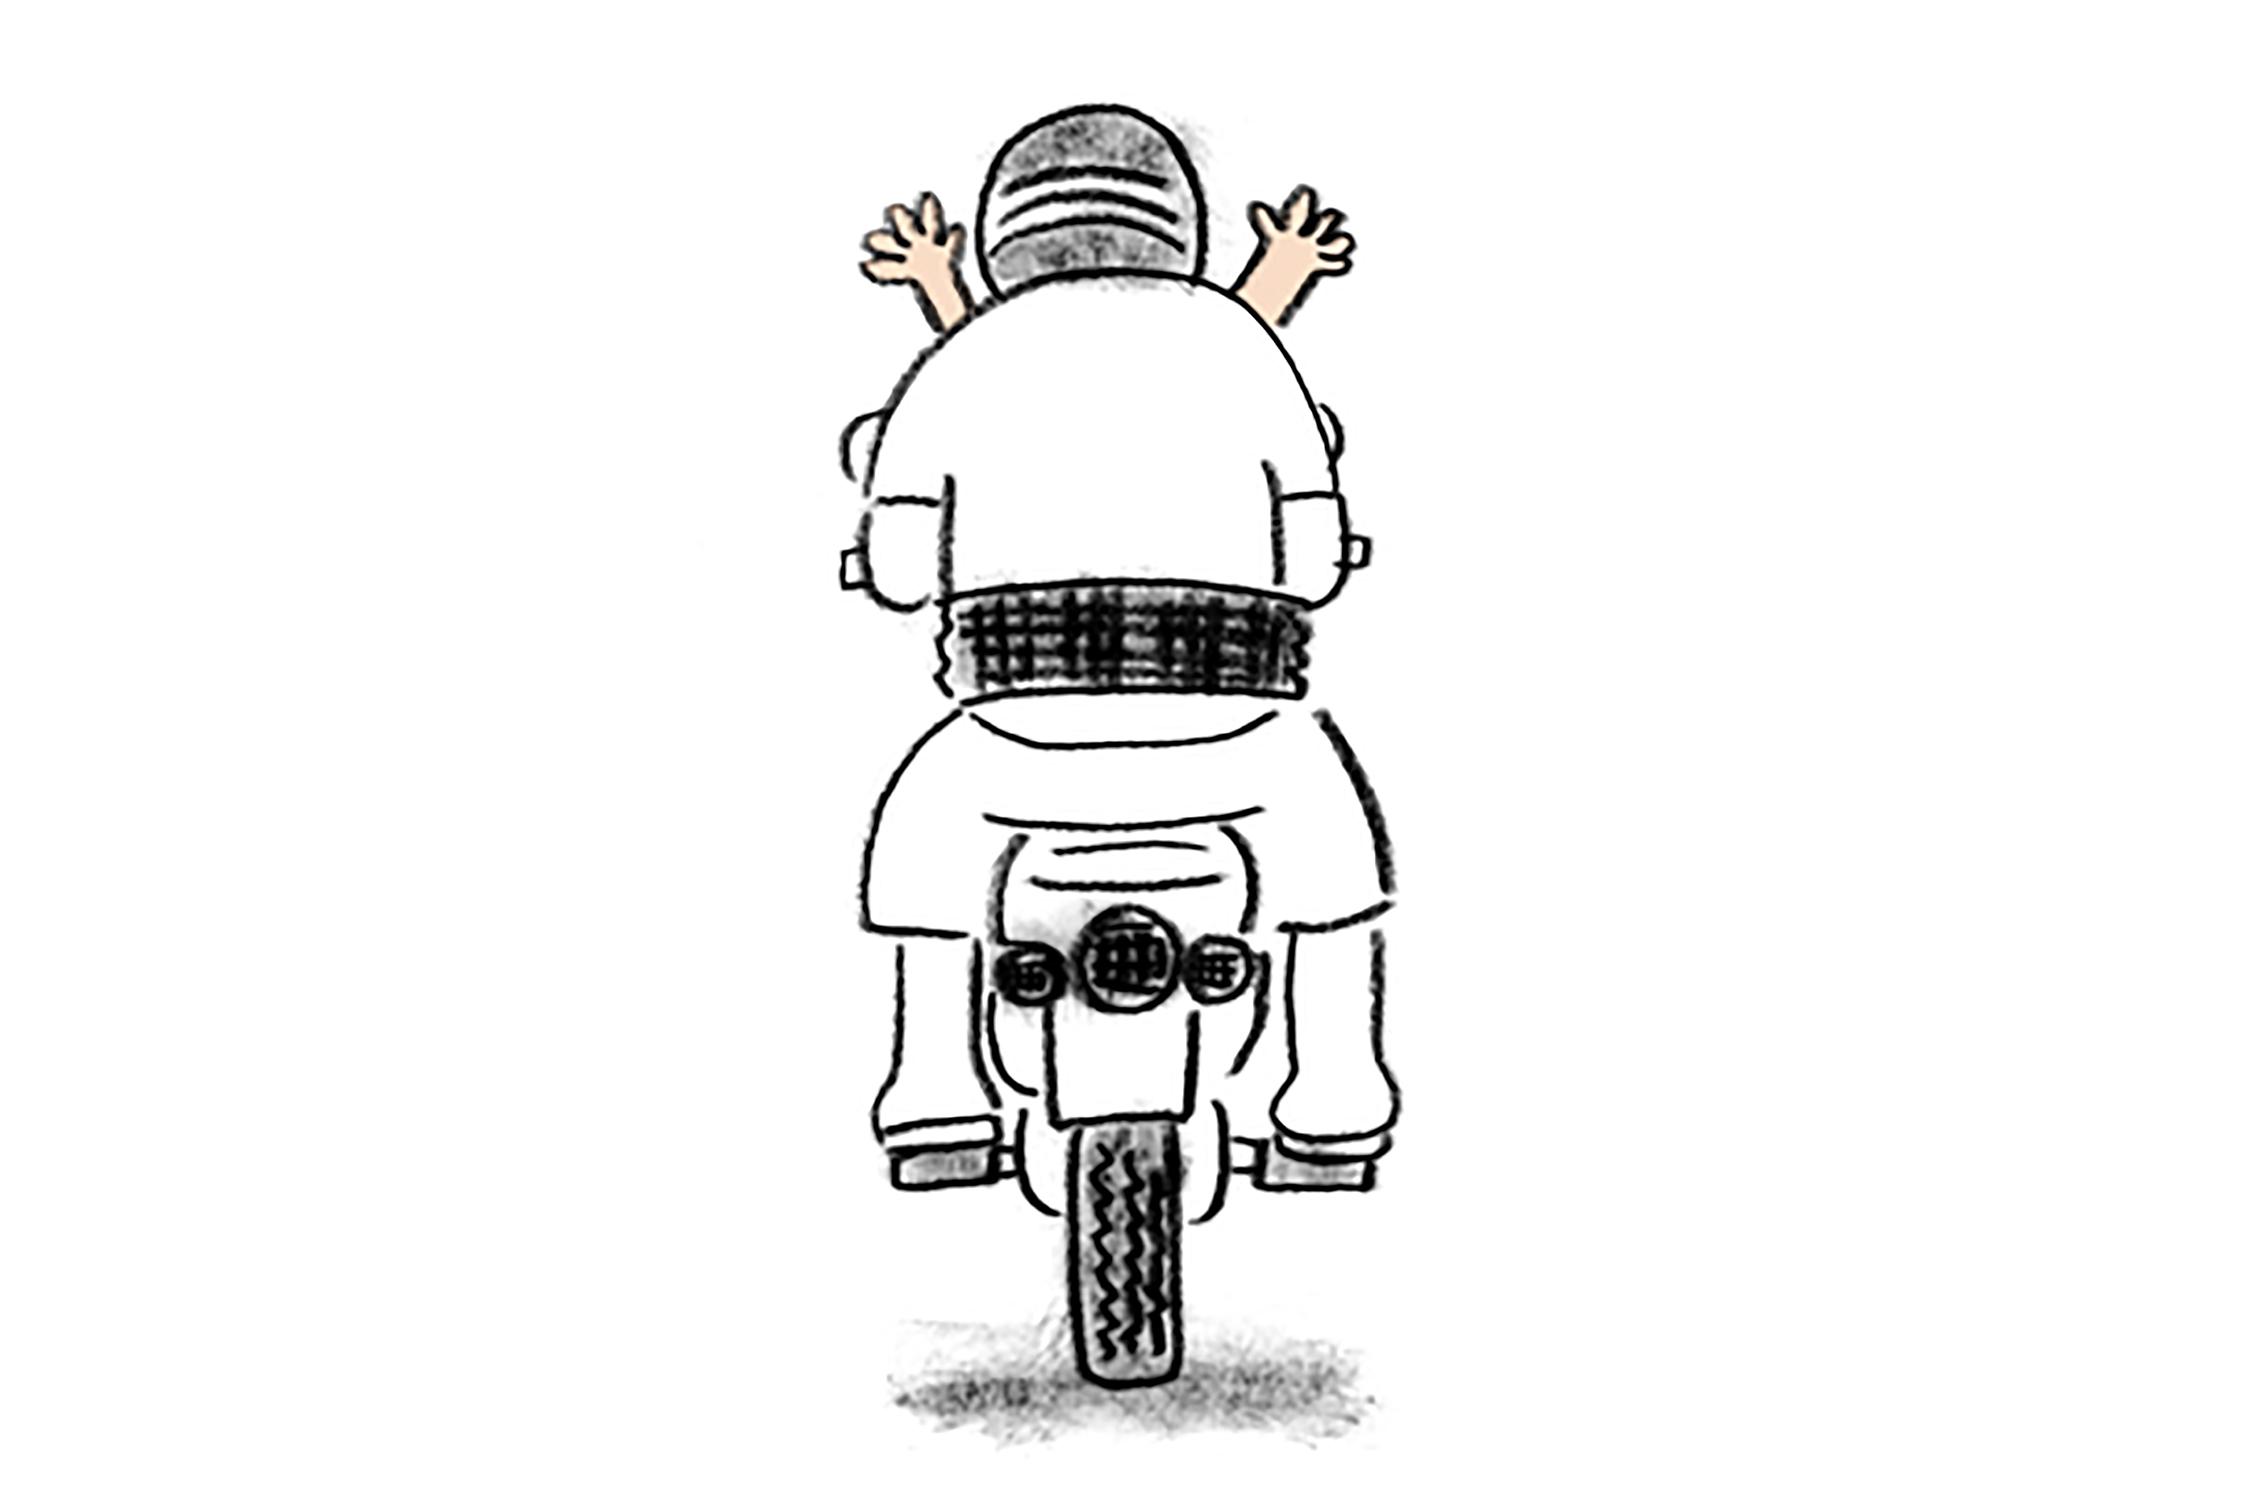 A Man with Pa Khoa Ma on the Motorcycle by Tunyaporn Hongtong